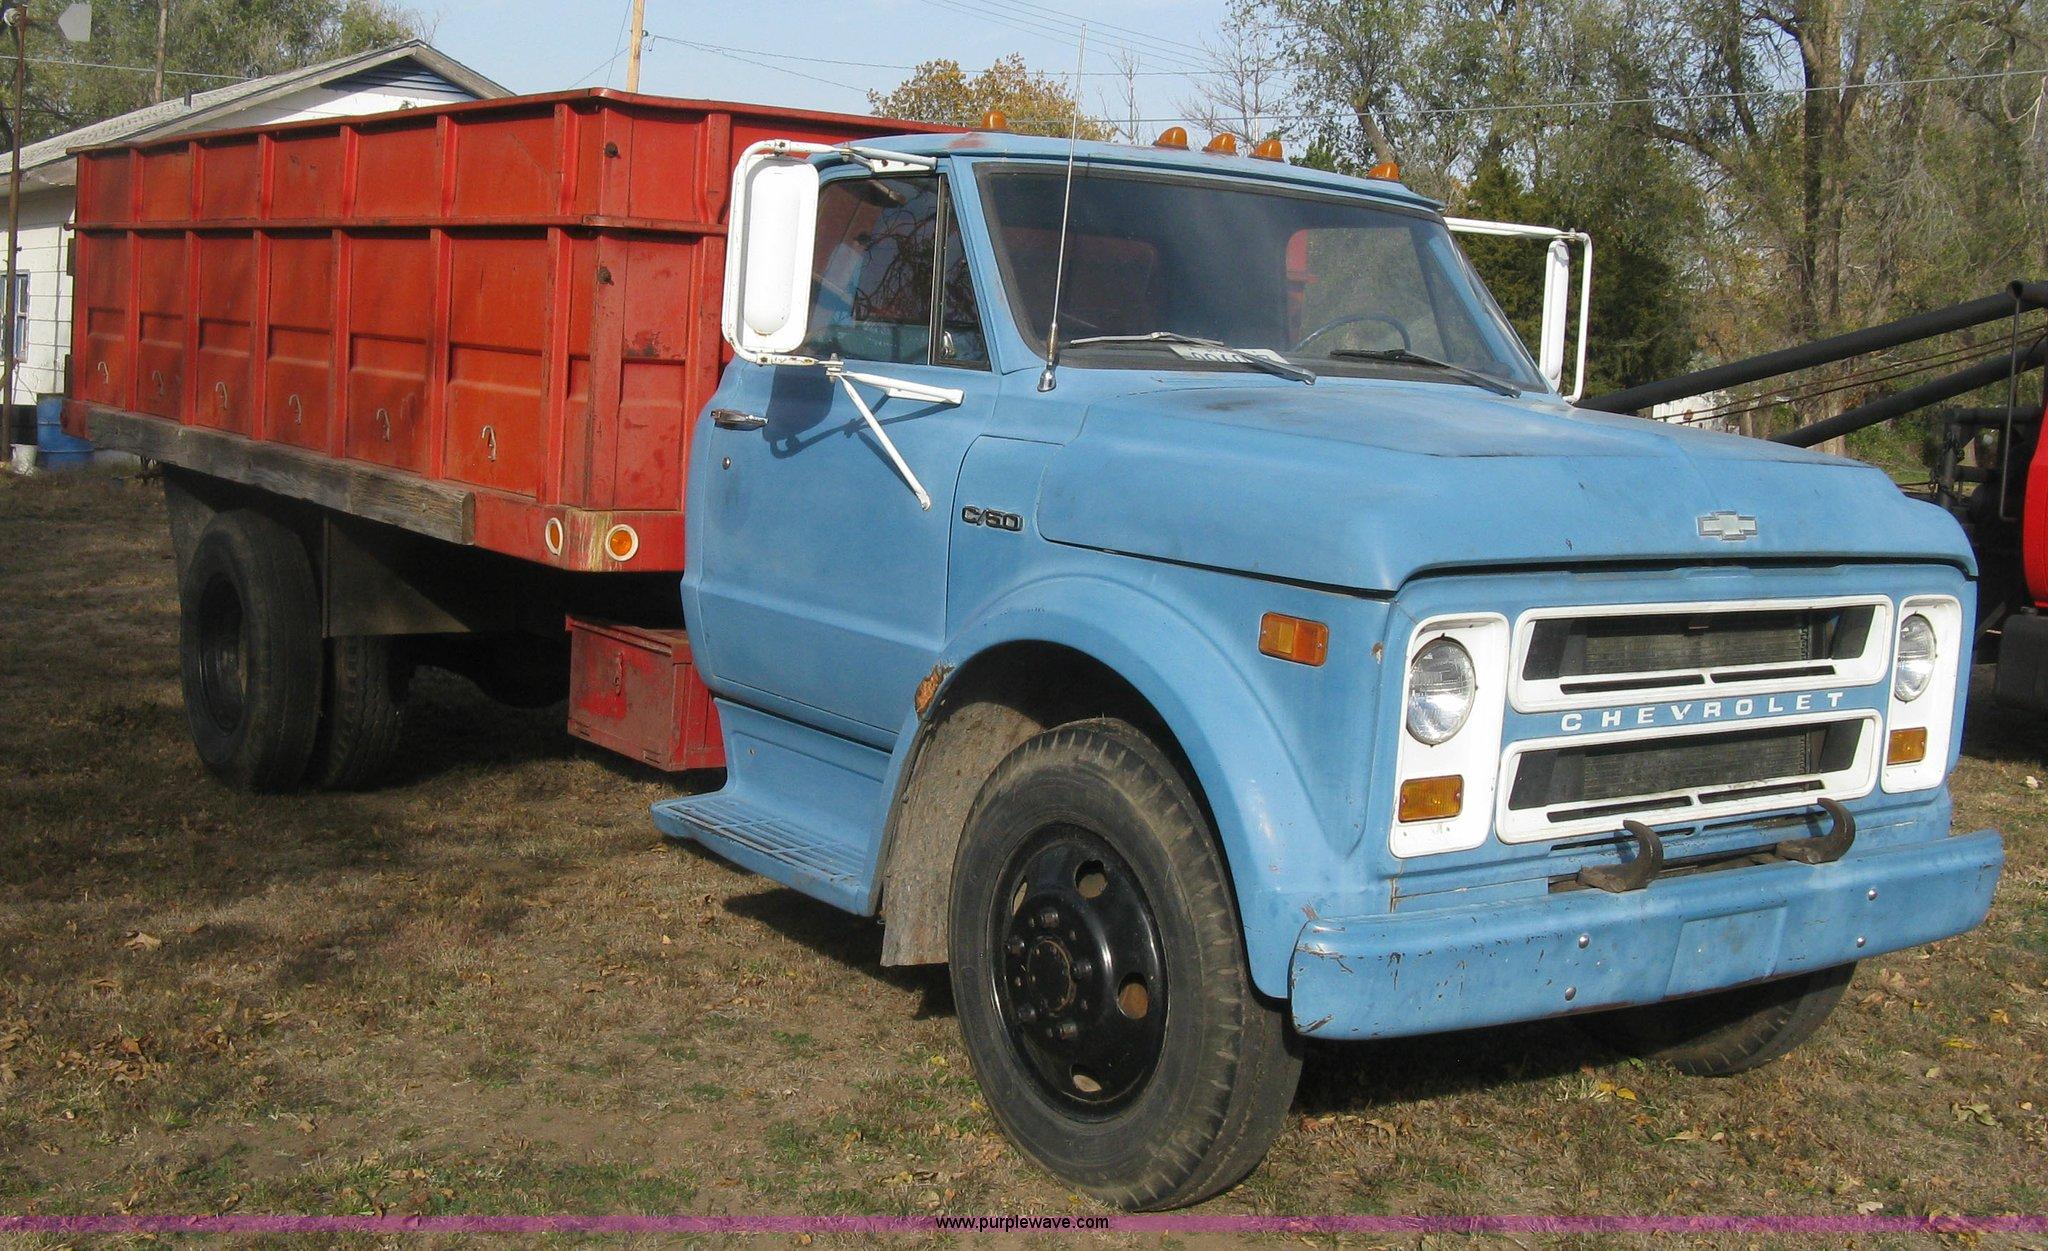 1971 chevrolet c50 stake bed dump truck item h9371 sold 1992 Chevy Truck h9371 image for item h9371 1971 chevrolet c50 stake bed dump truck